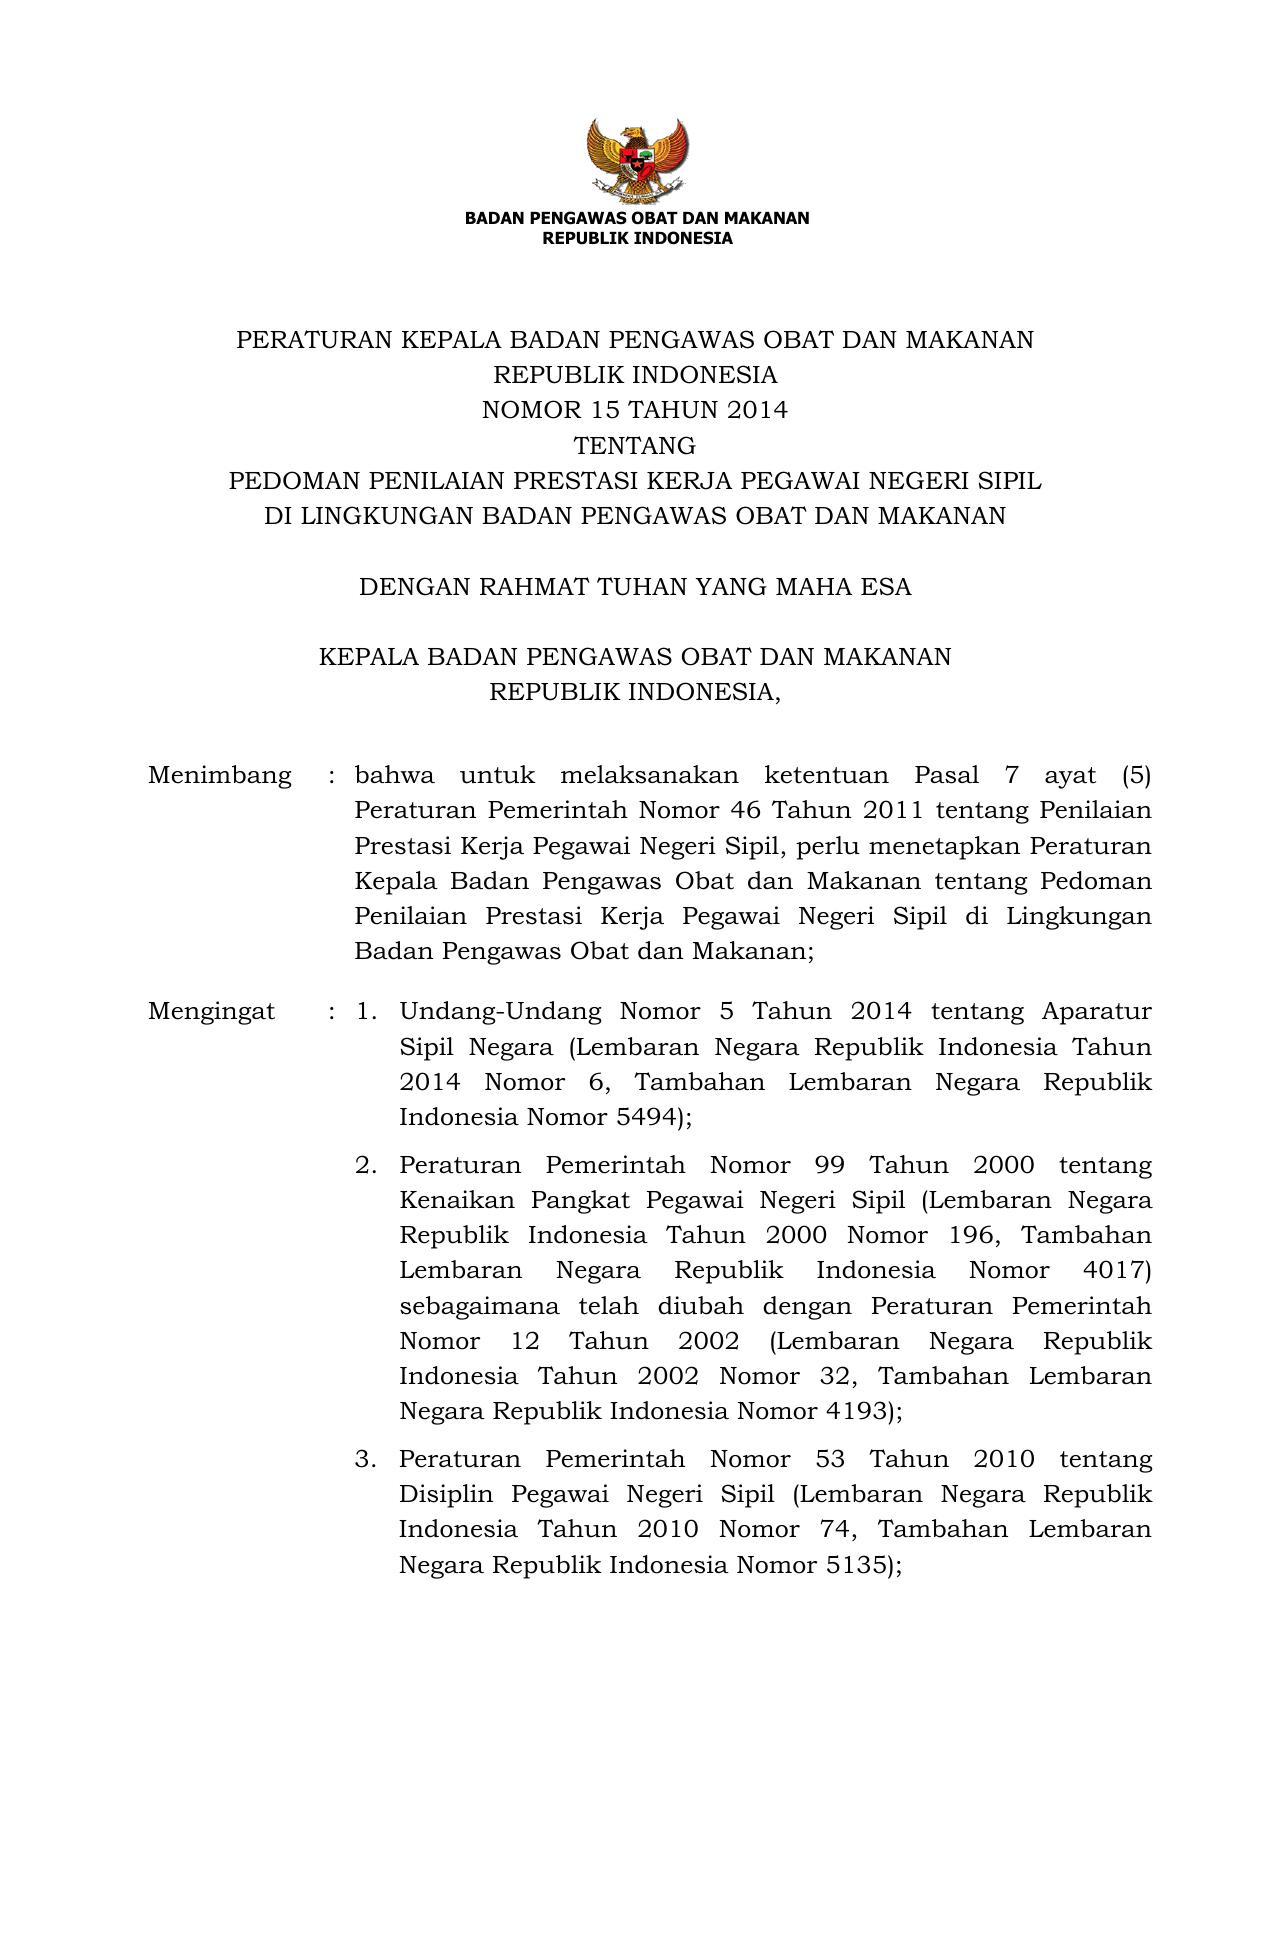 Pedoman Penilaian Prestasi Kerja Pegawai Negeri Sipil Di